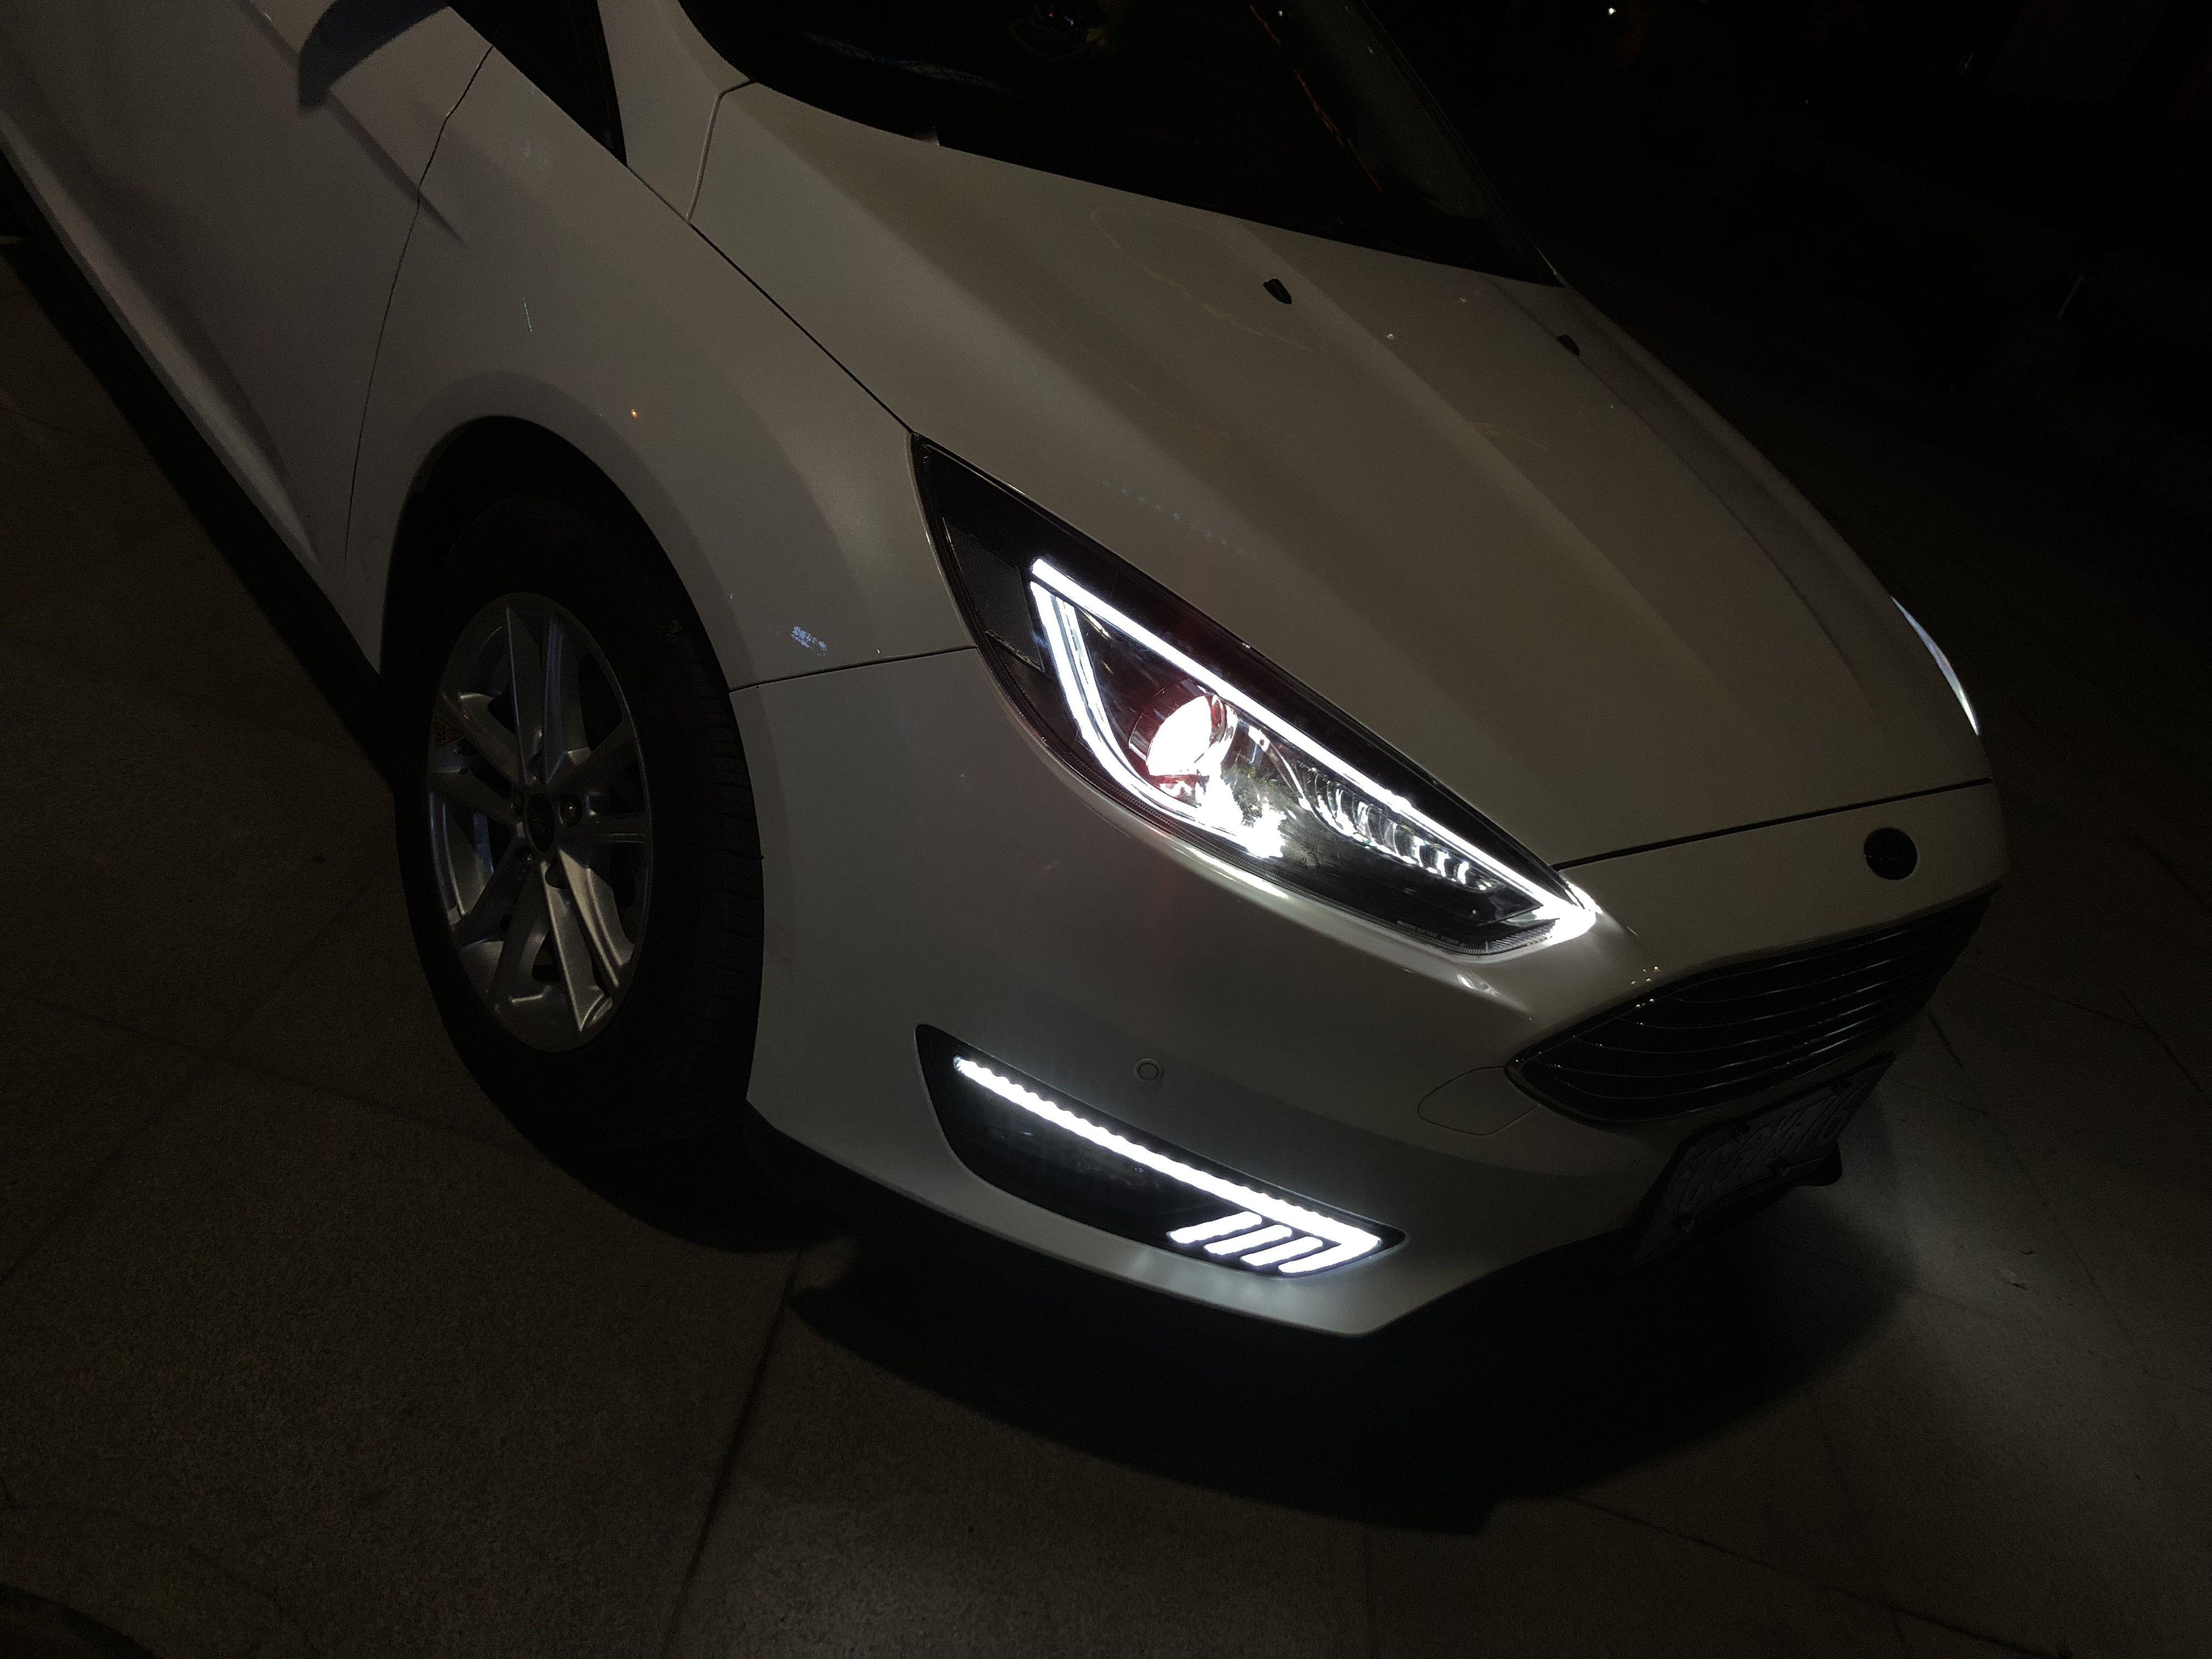 Vland New Style Car Lamp For Focus 2015 2017 Headlamp Vland